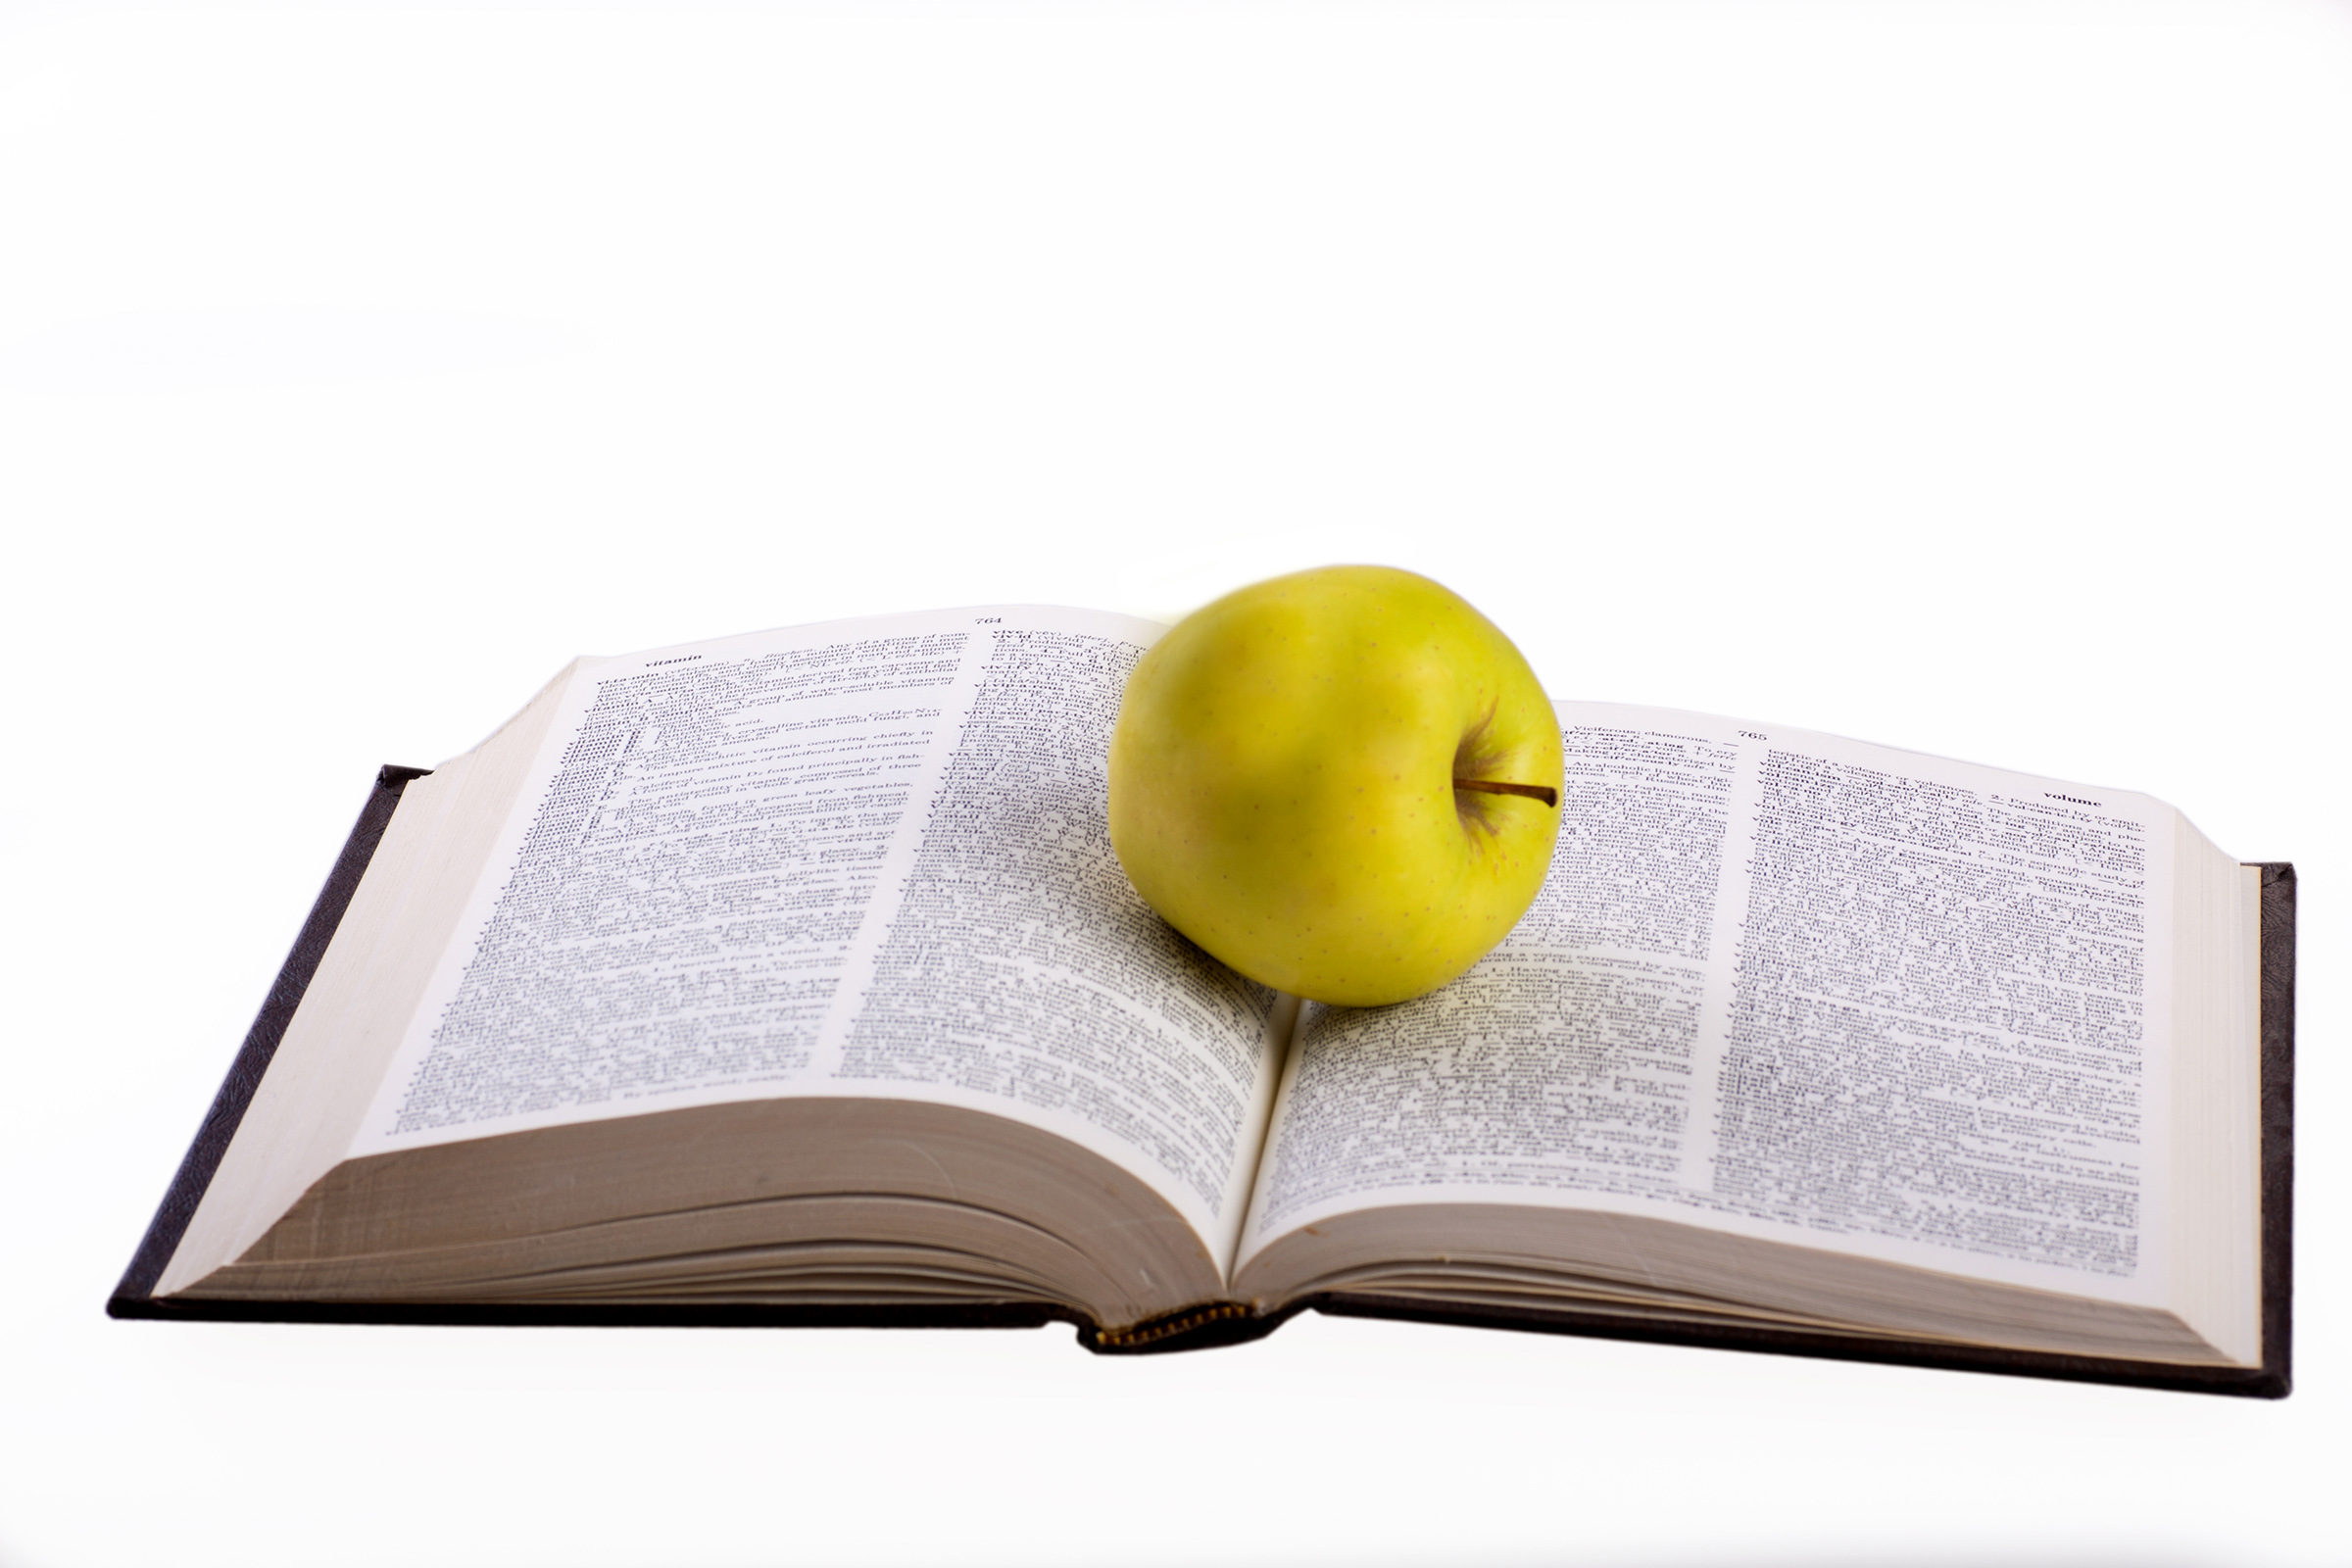 Health Education, Apple, Literature, White, University, HQ Photo